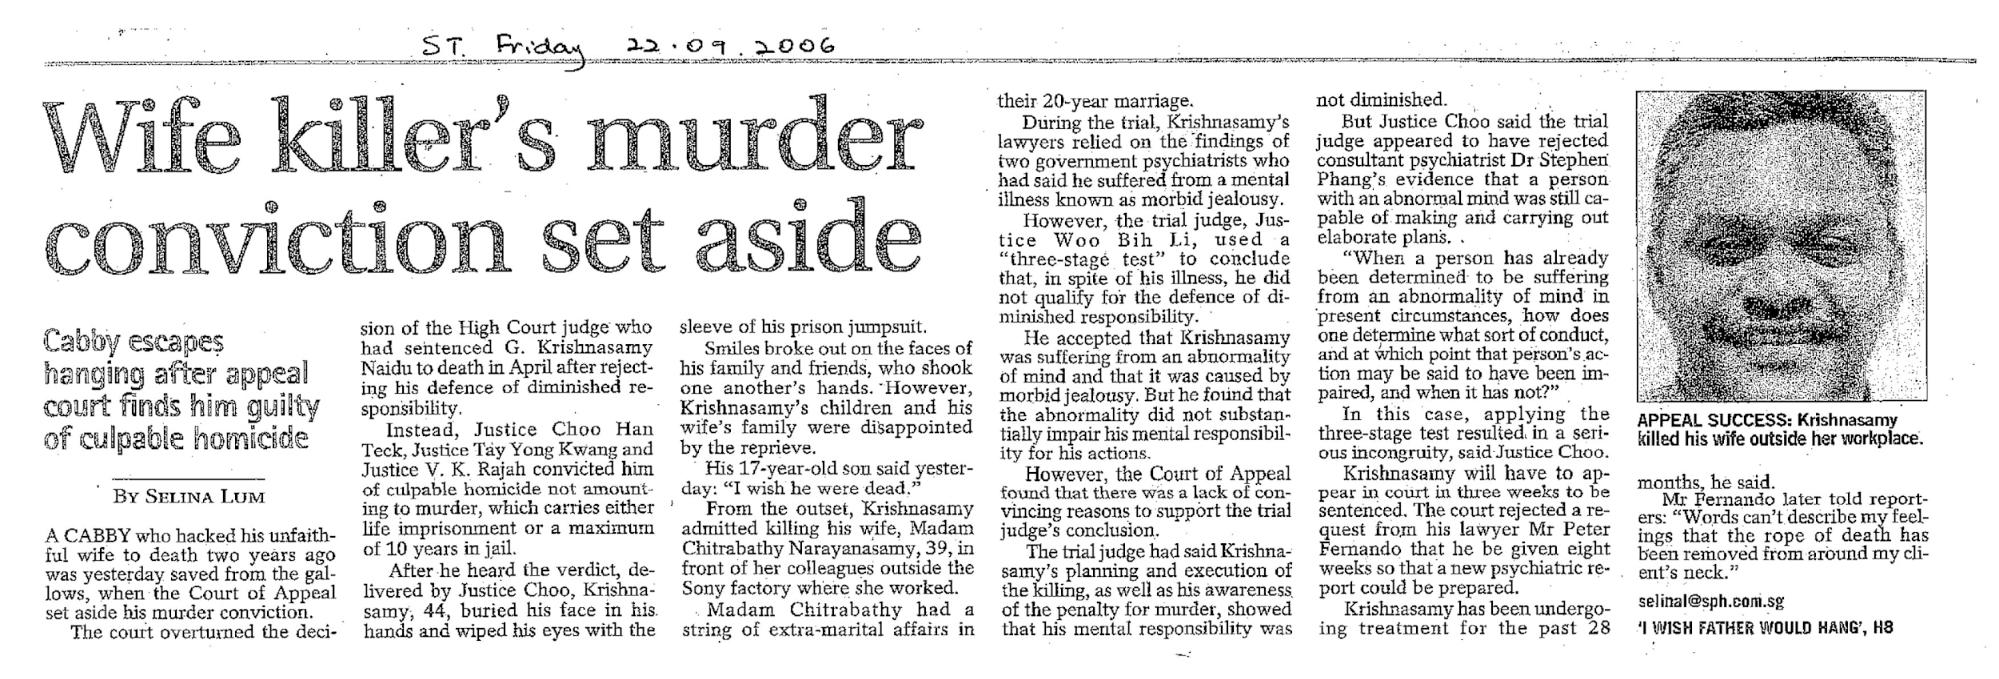 news report on G. Krishnasamy Naidu